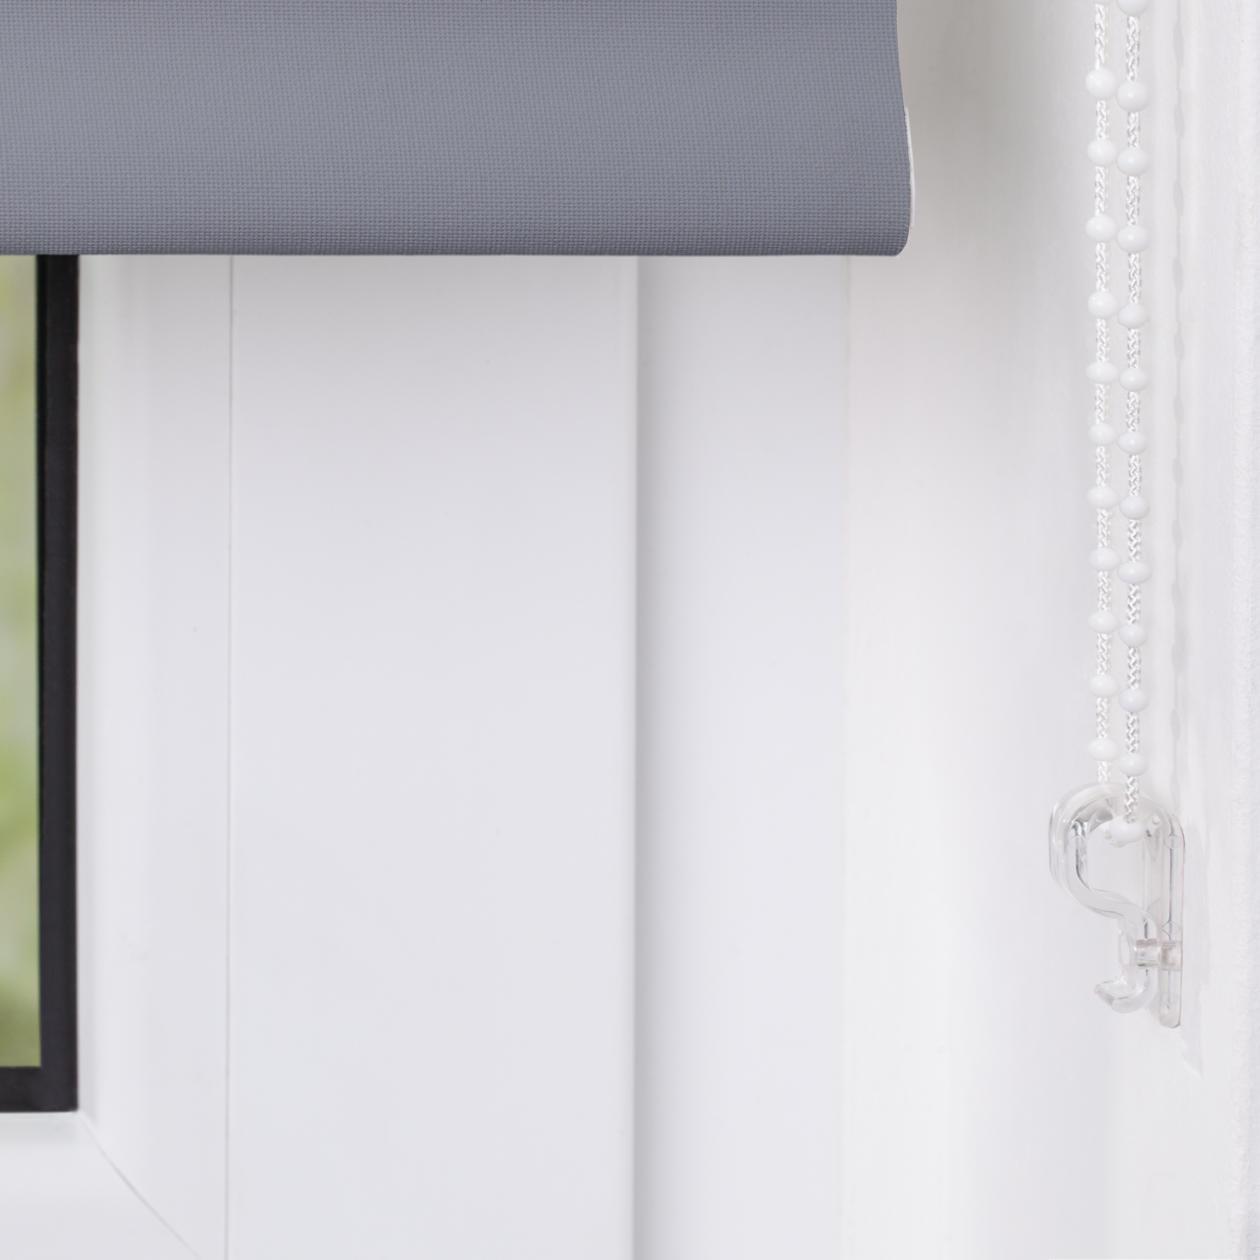 rollo verdunkelung kettenzug lichblick shop. Black Bedroom Furniture Sets. Home Design Ideas